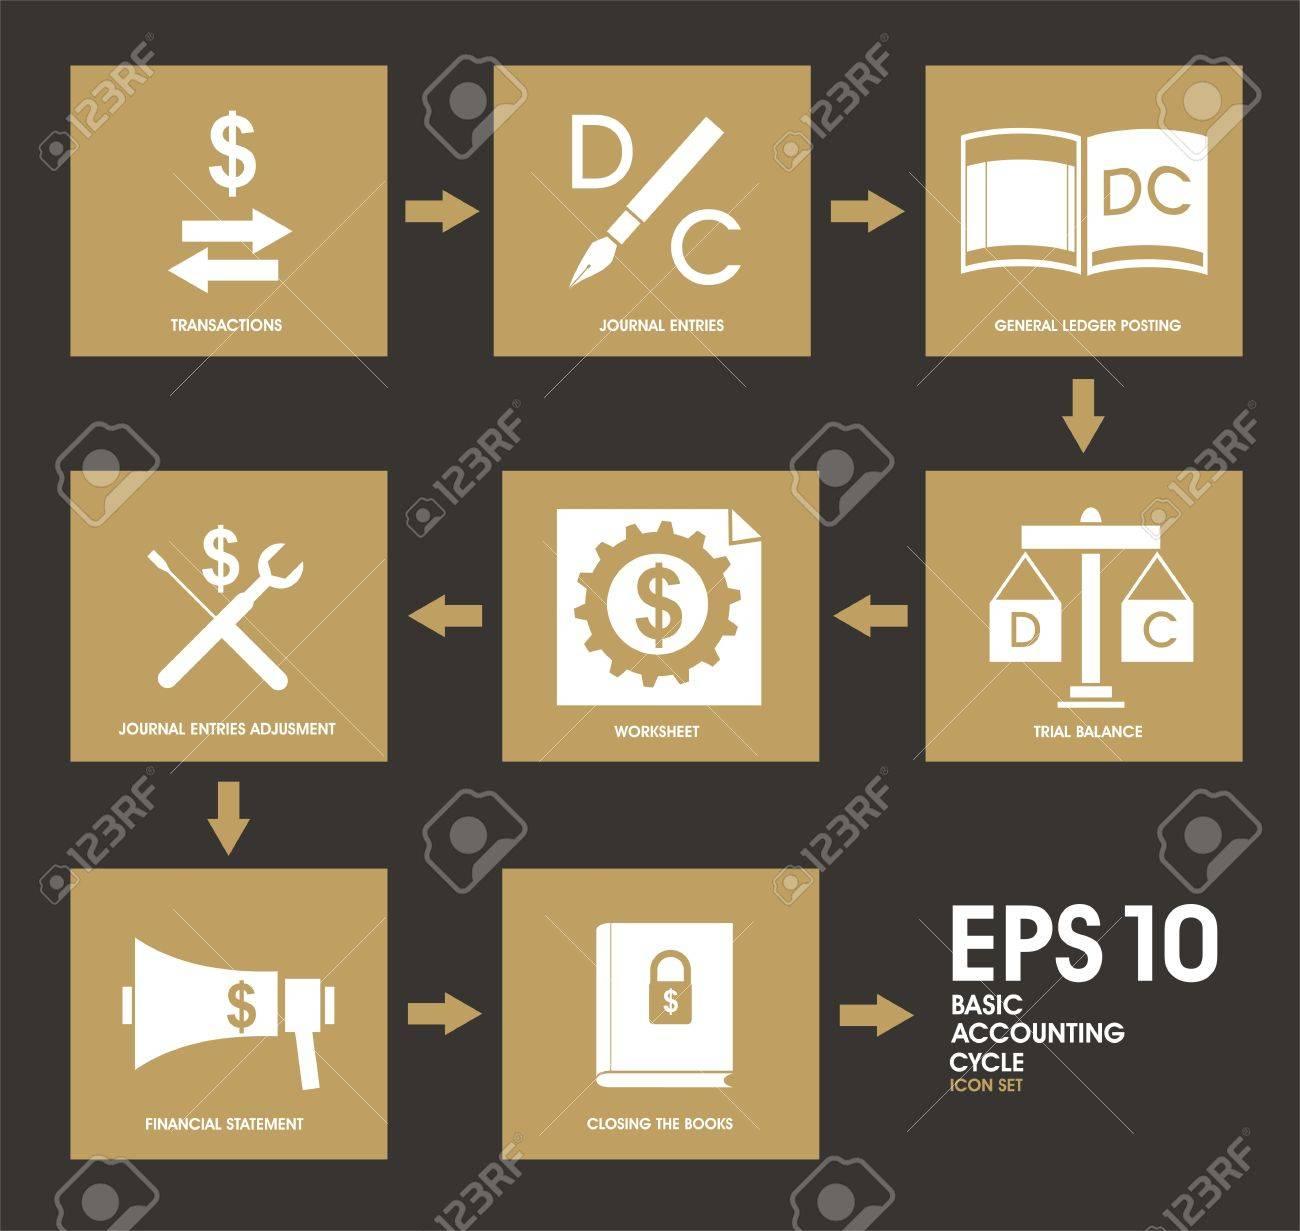 Basic Accounting Cycle Icon Set Stock Vector